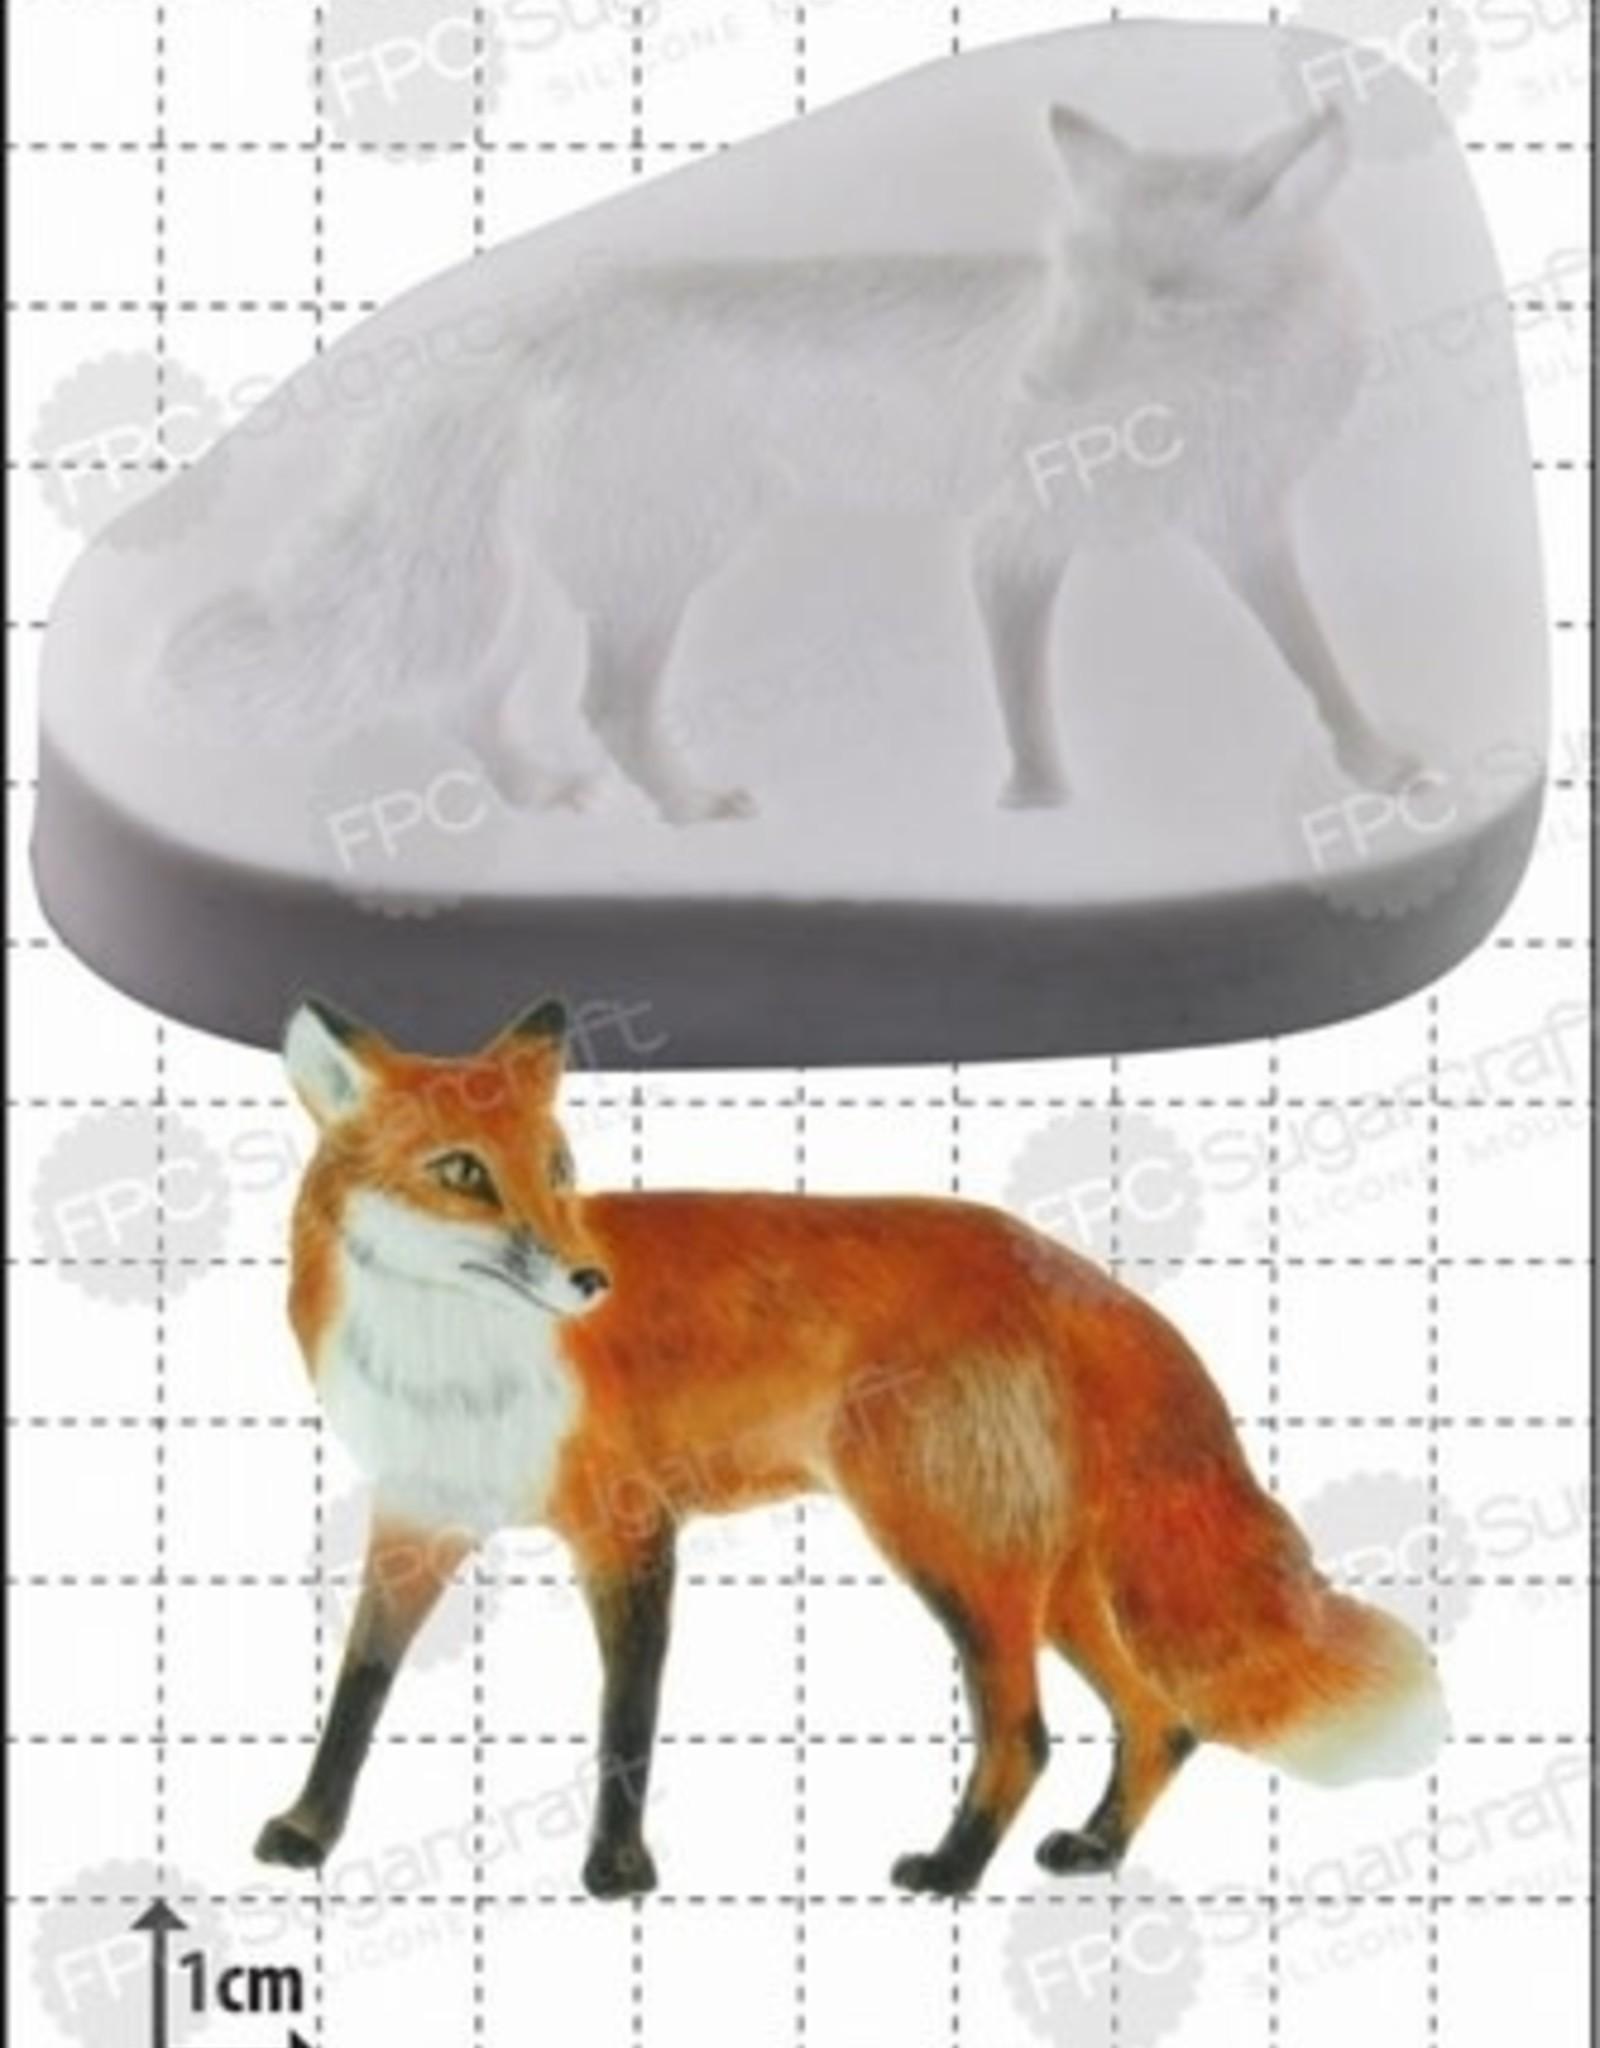 FPC FPC Fox/Vos